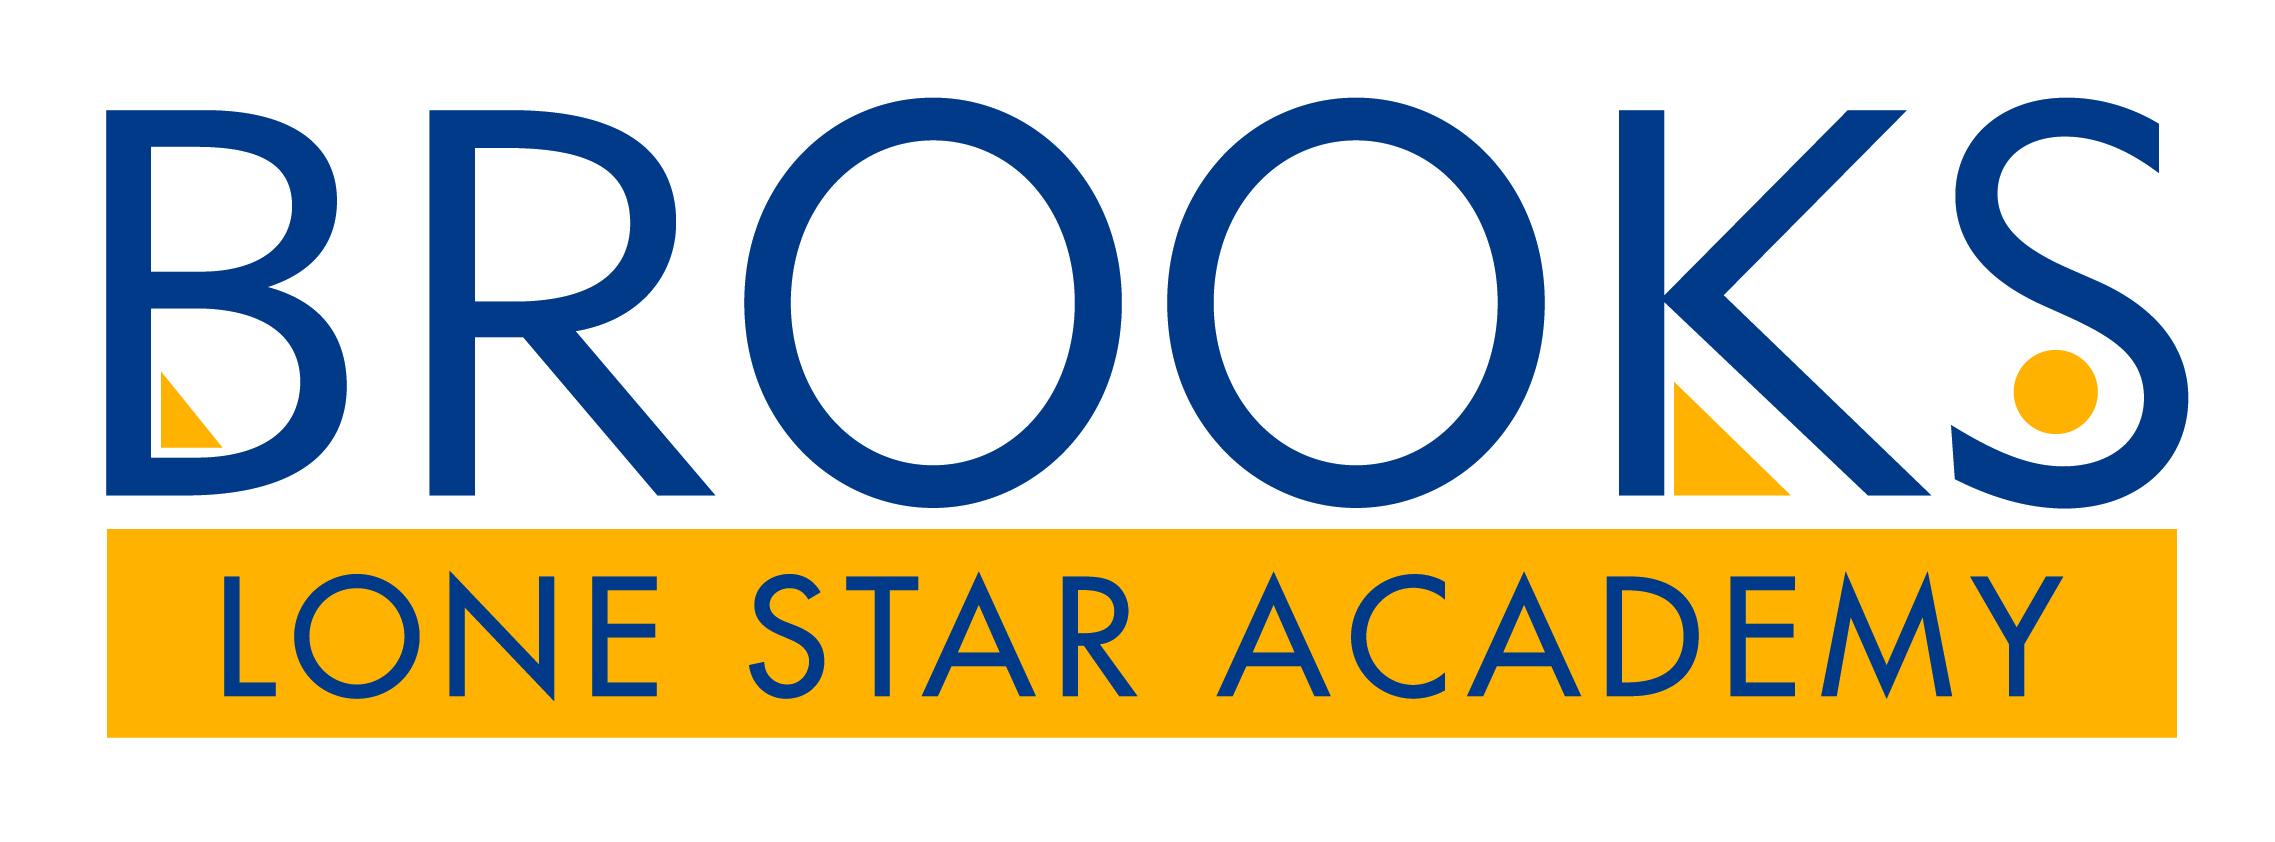 brooks-lone-star-logo.jpg